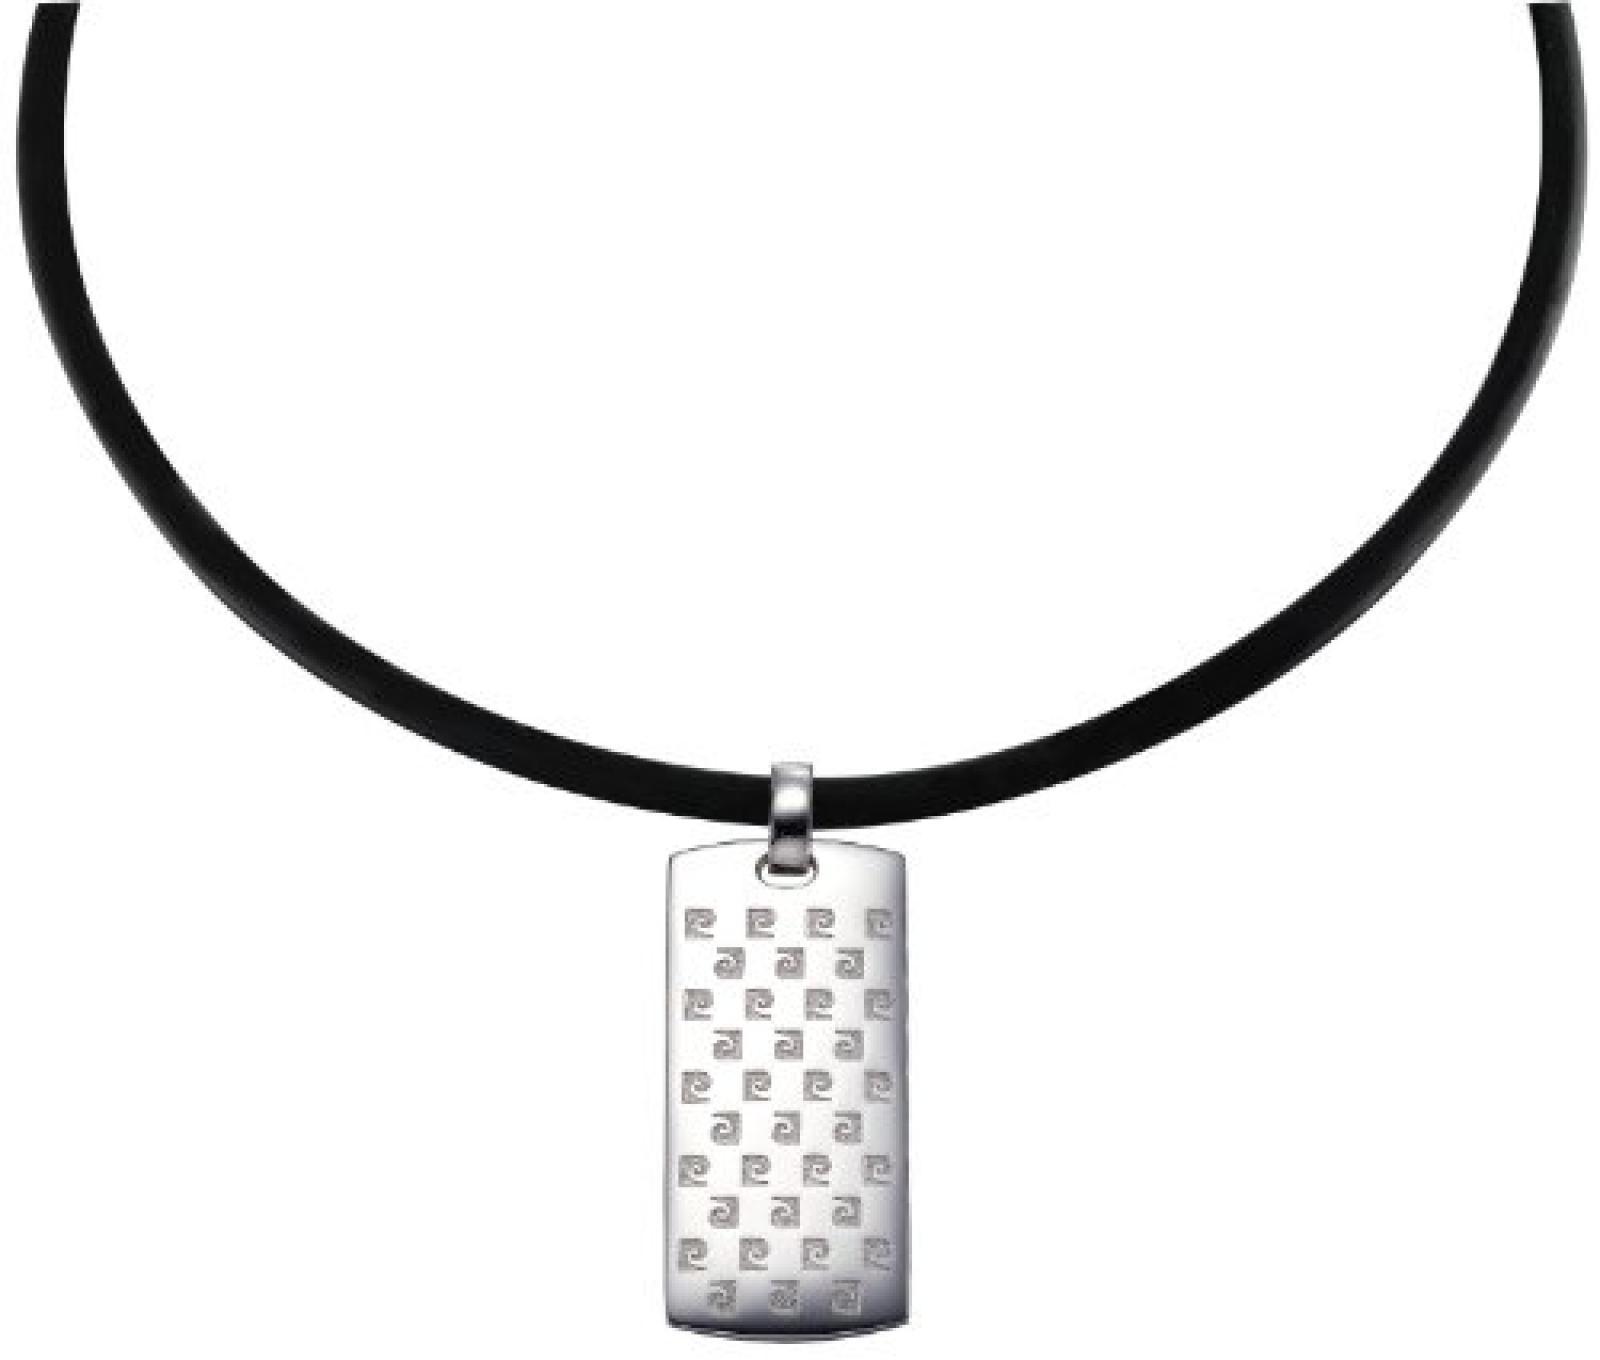 Pierre Cardin Unisex Halskette 925 Sterling Silber rhodiniert Leder Influence 50 cm PCNL90397A500